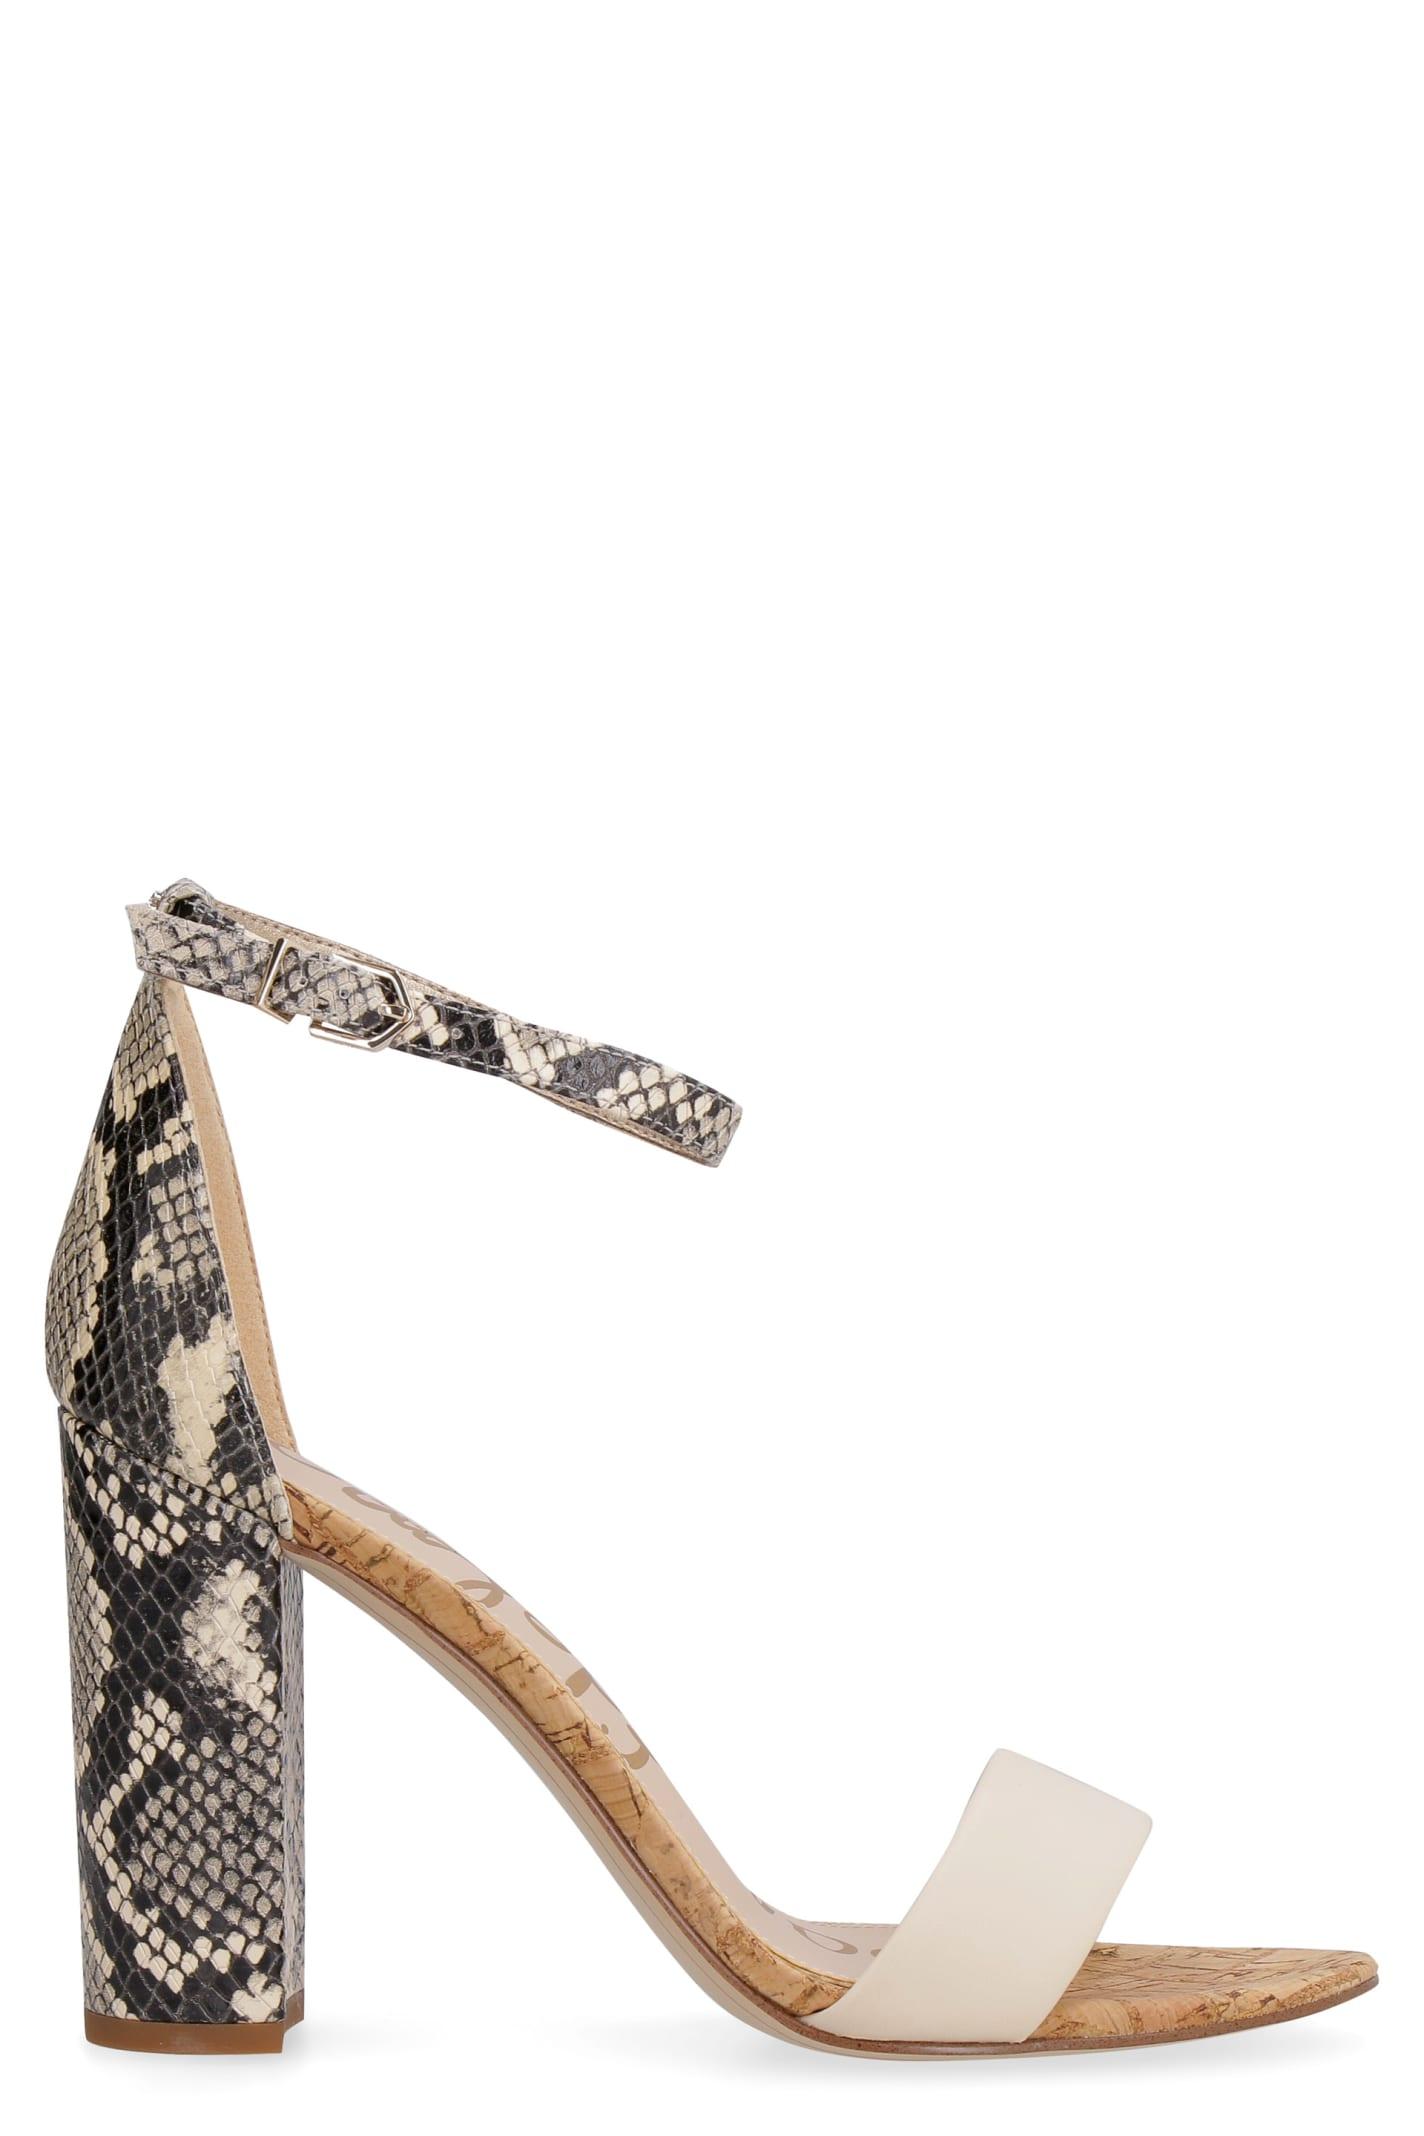 Buy Sam Edelman Yaro Heeled Sandals online, shop Sam Edelman shoes with free shipping